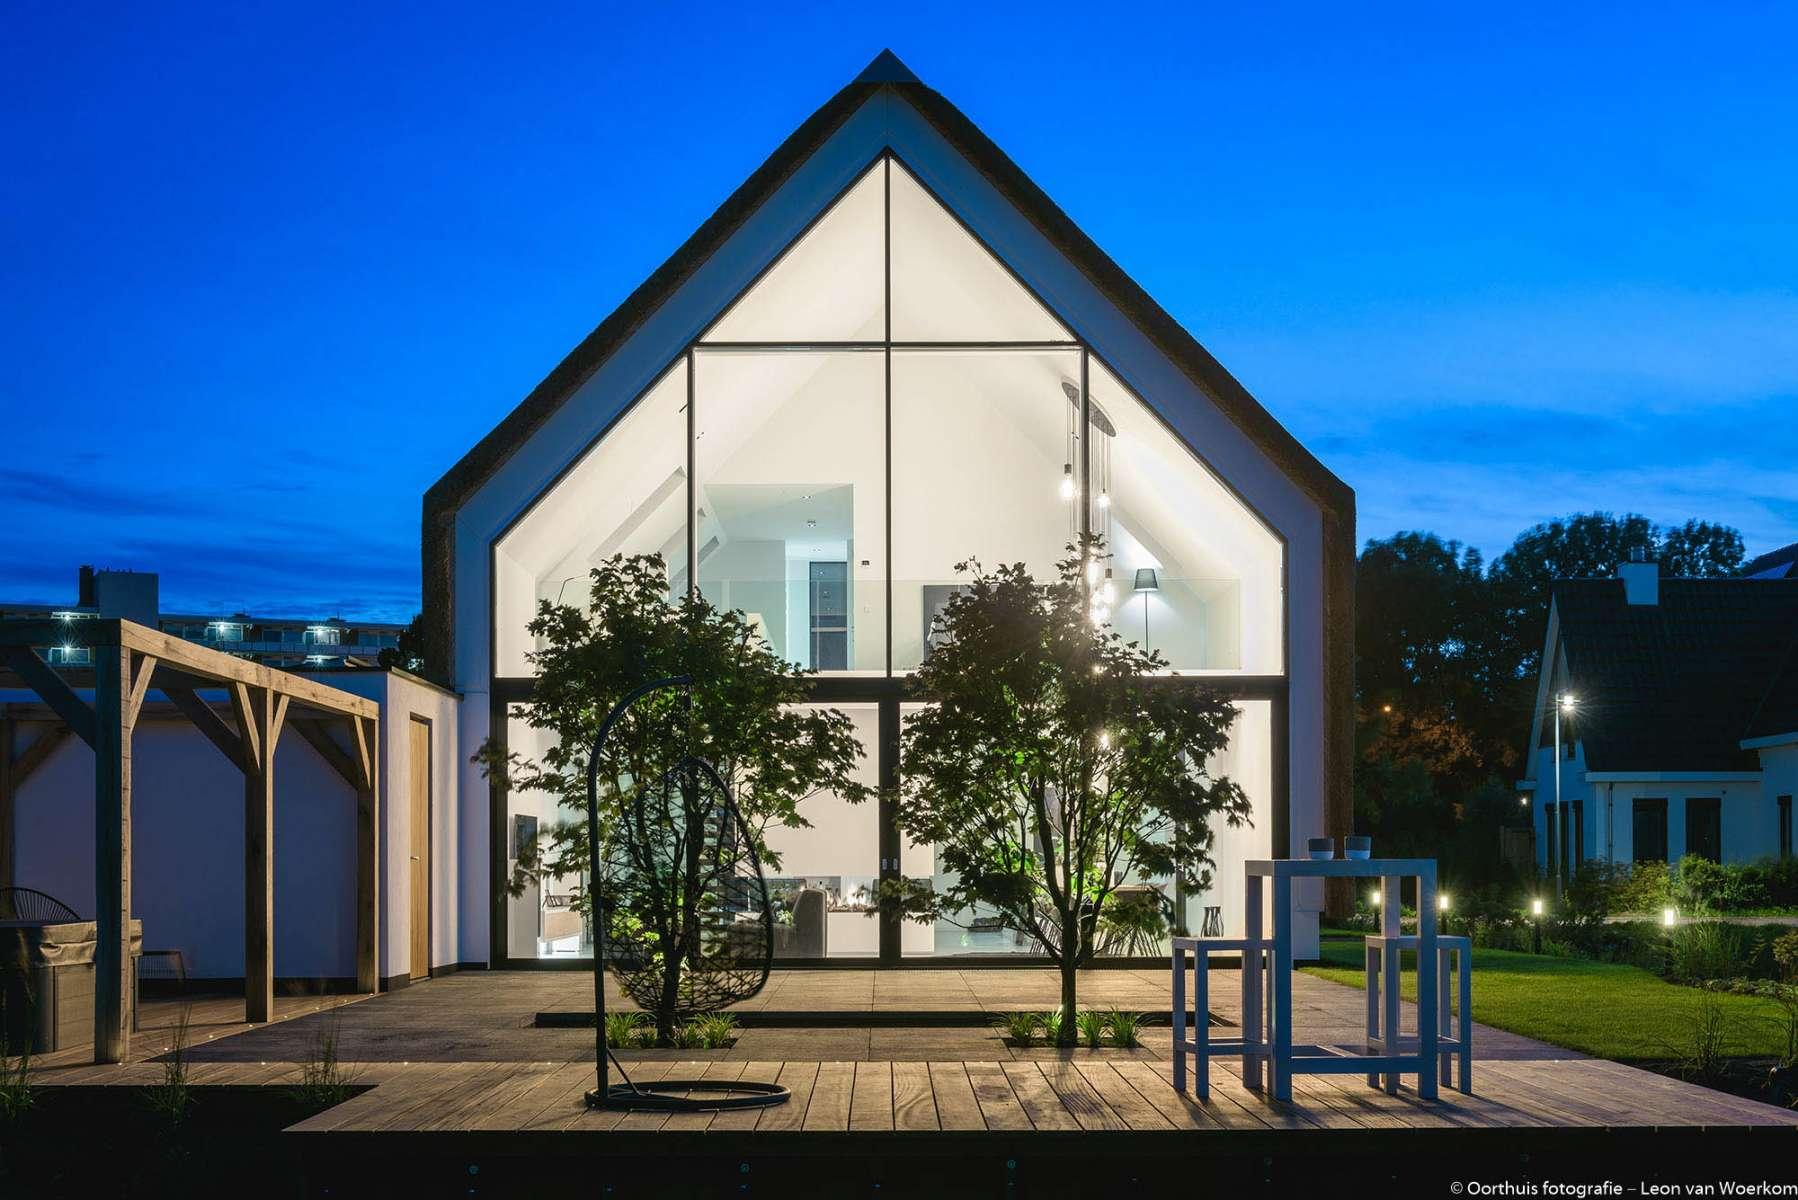 moderne villa met gestucte gevels en rieten kap. Black Bedroom Furniture Sets. Home Design Ideas